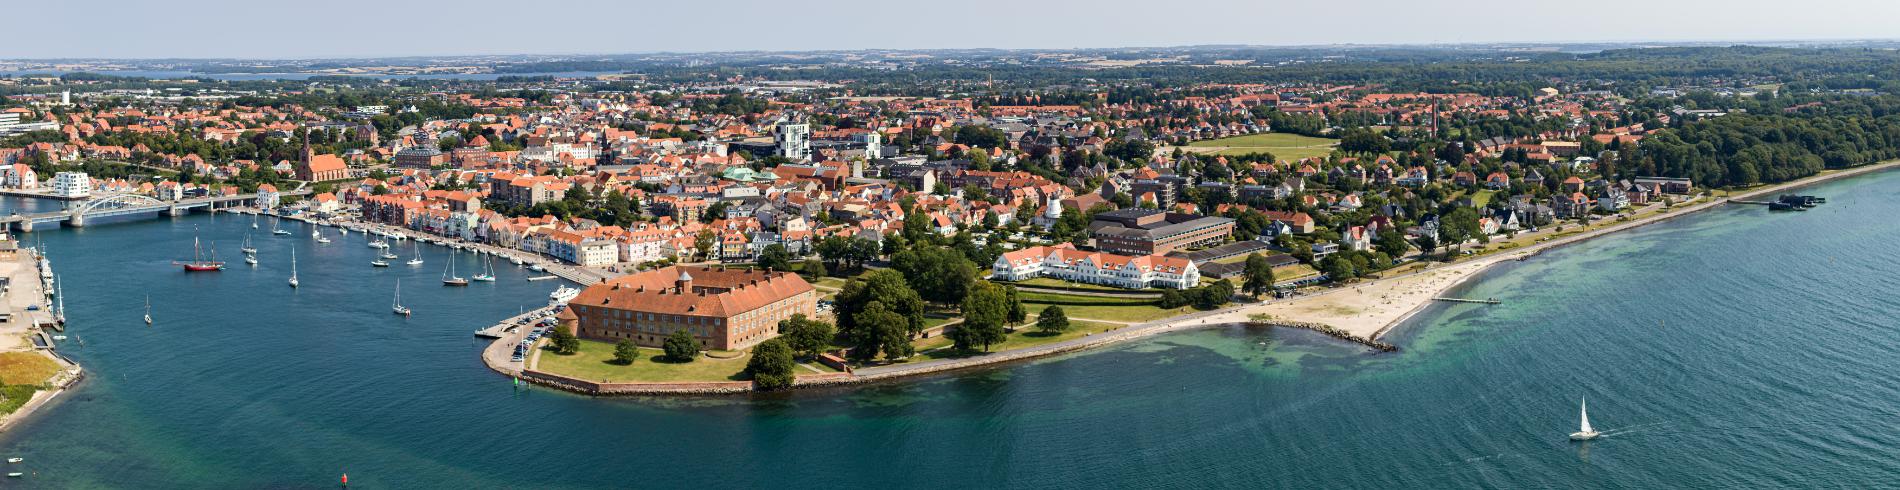 Billeder fra Sønderborg Kommune cover image